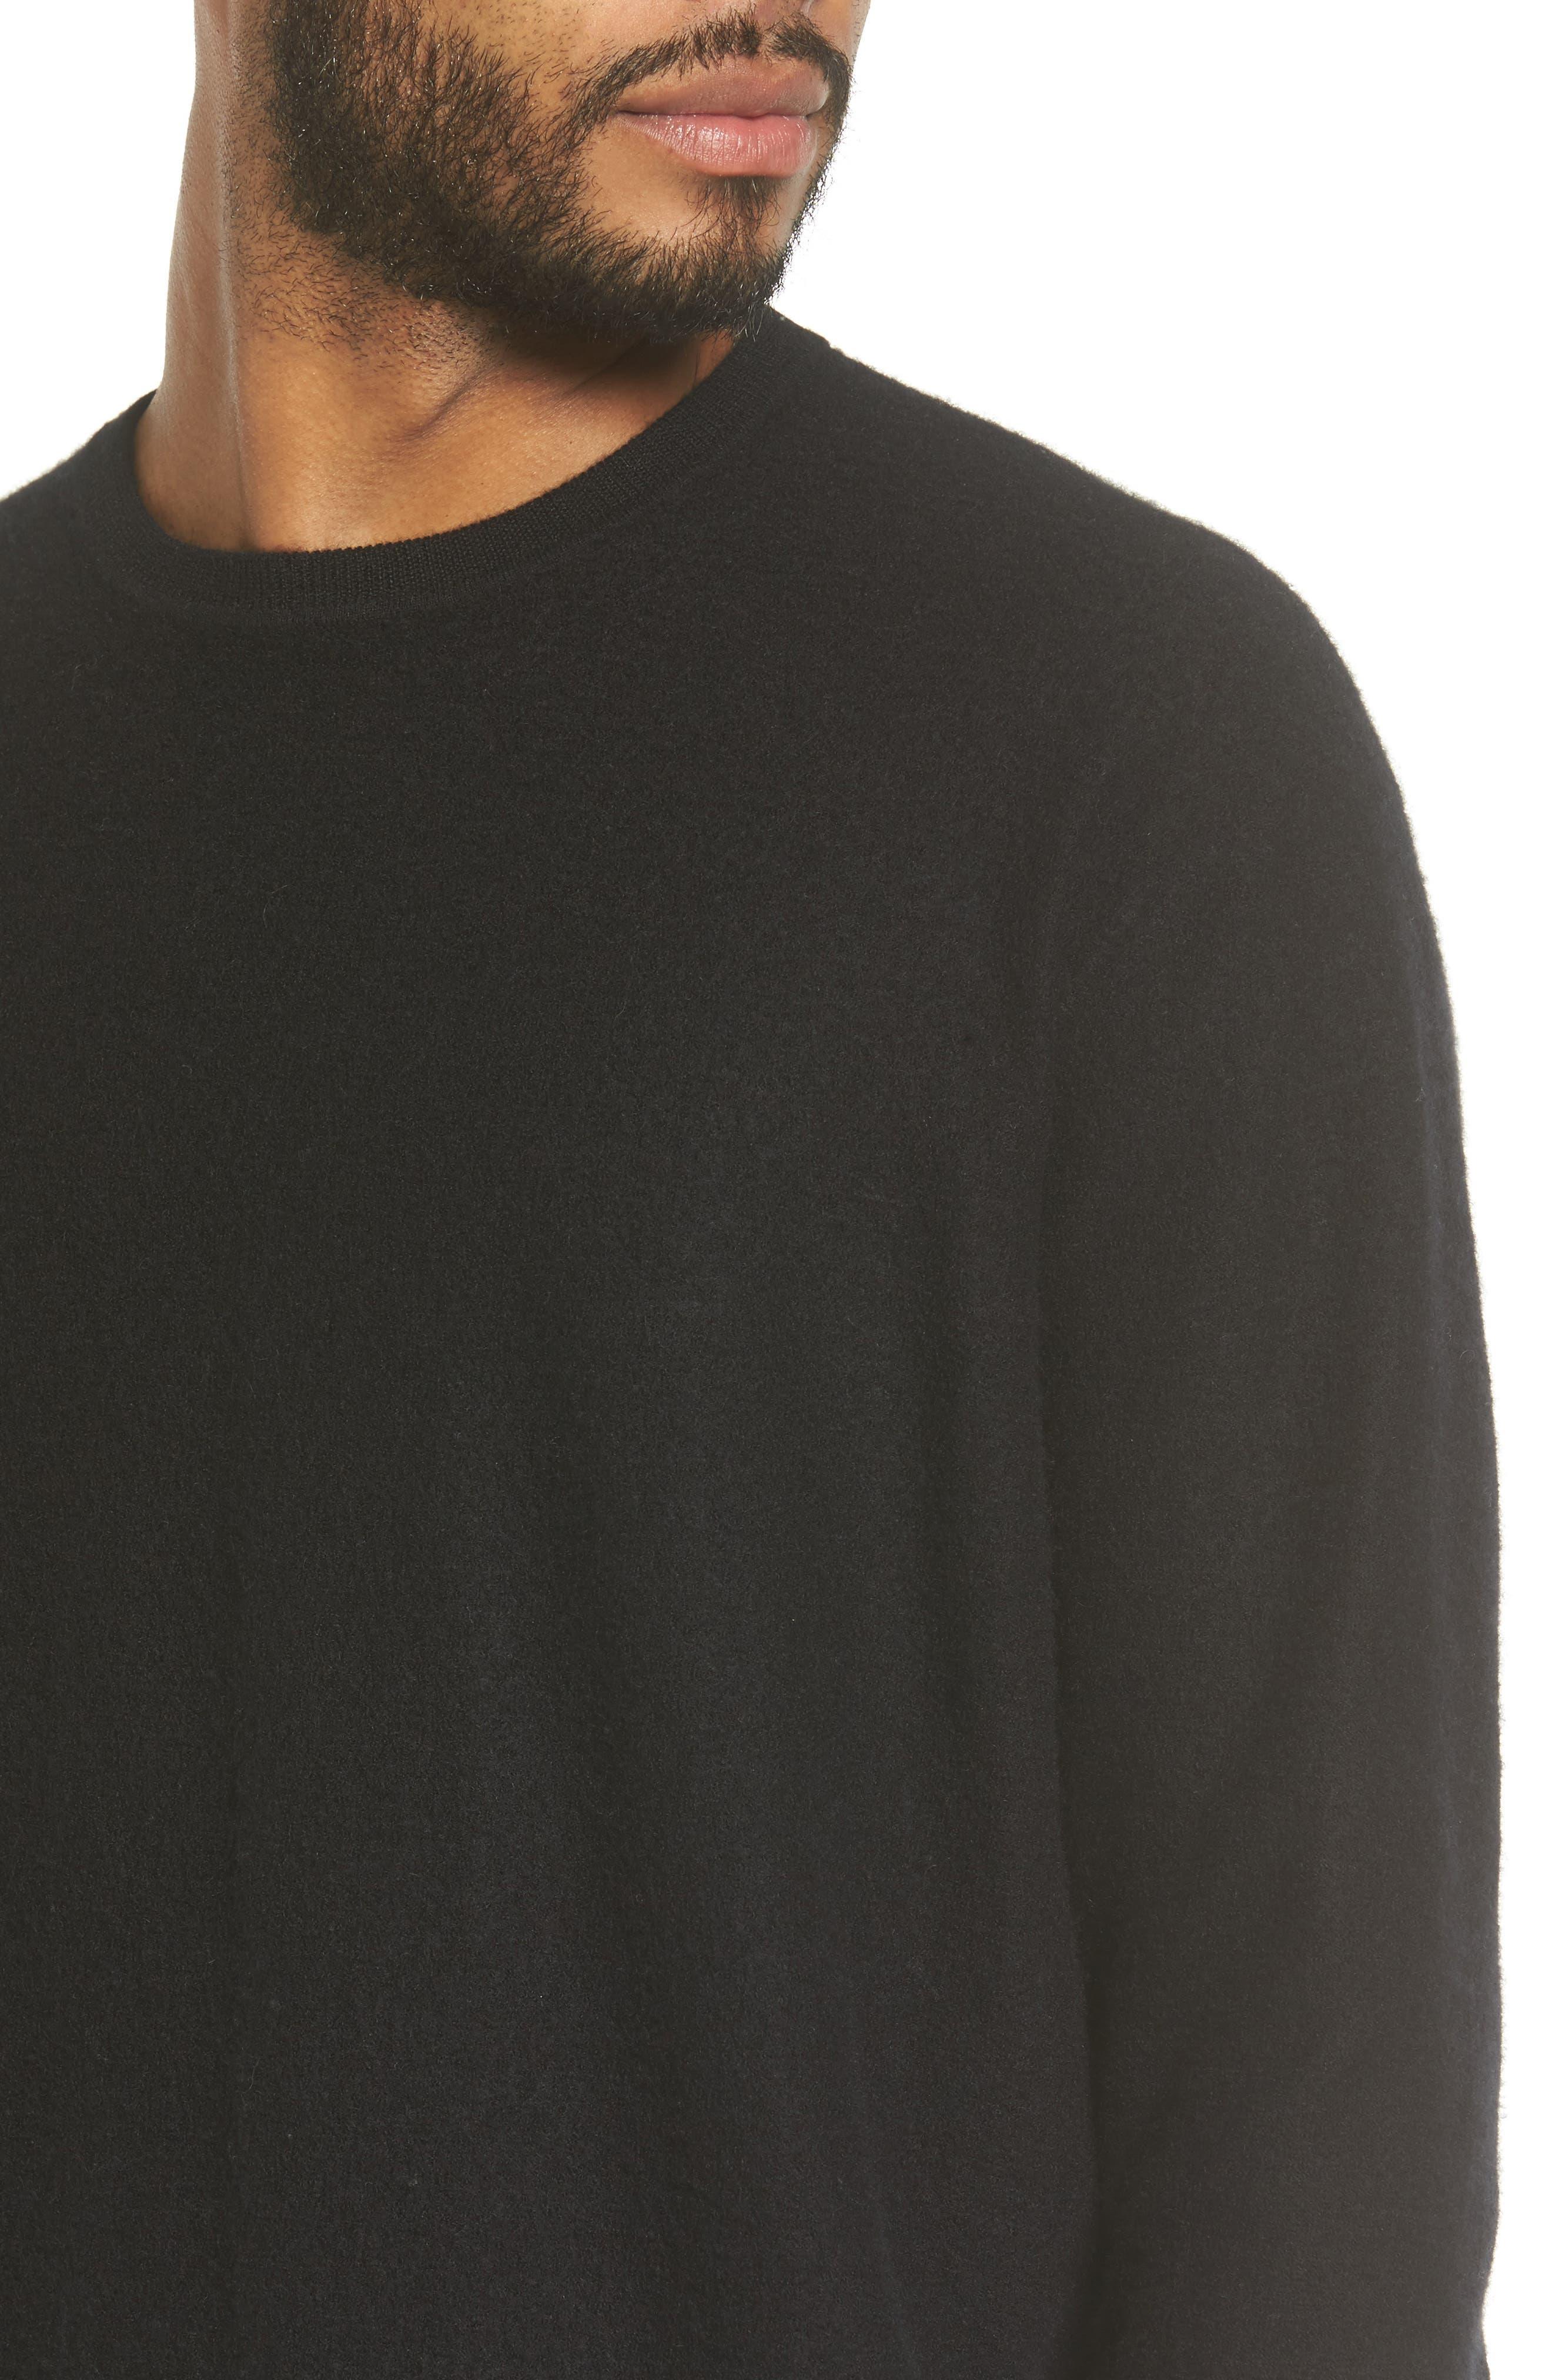 Cashmere Crewneck Sweater,                             Alternate thumbnail 4, color,                             001